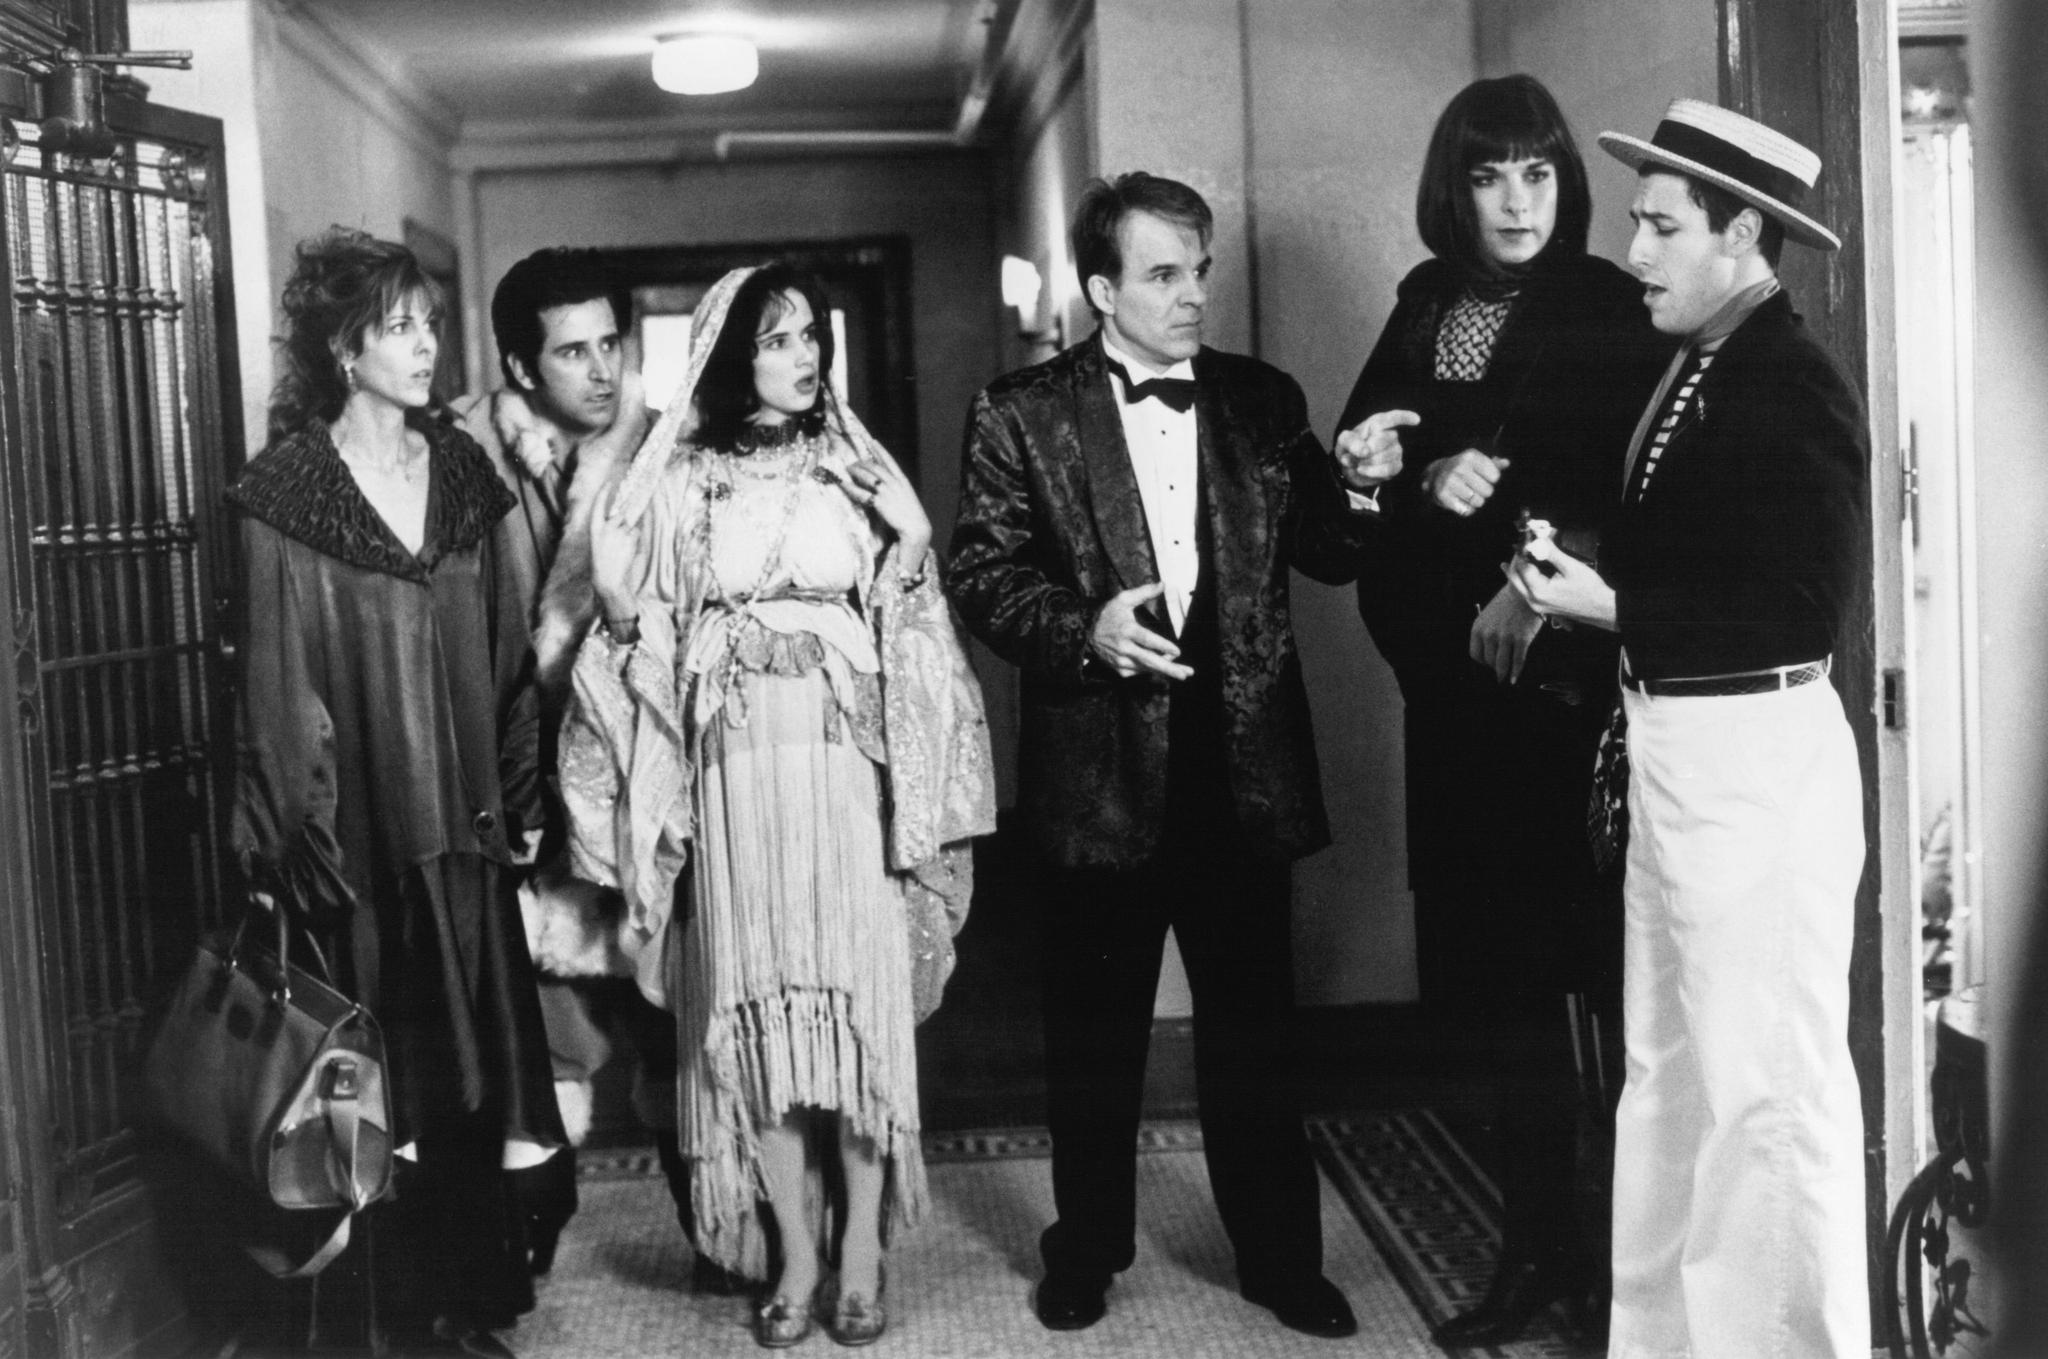 Steve Martin, Juliette Lewis, Liev Schreiber, Adam Sandler, Anthony LaPaglia, and Rita Wilson in Mixed Nuts (1994)